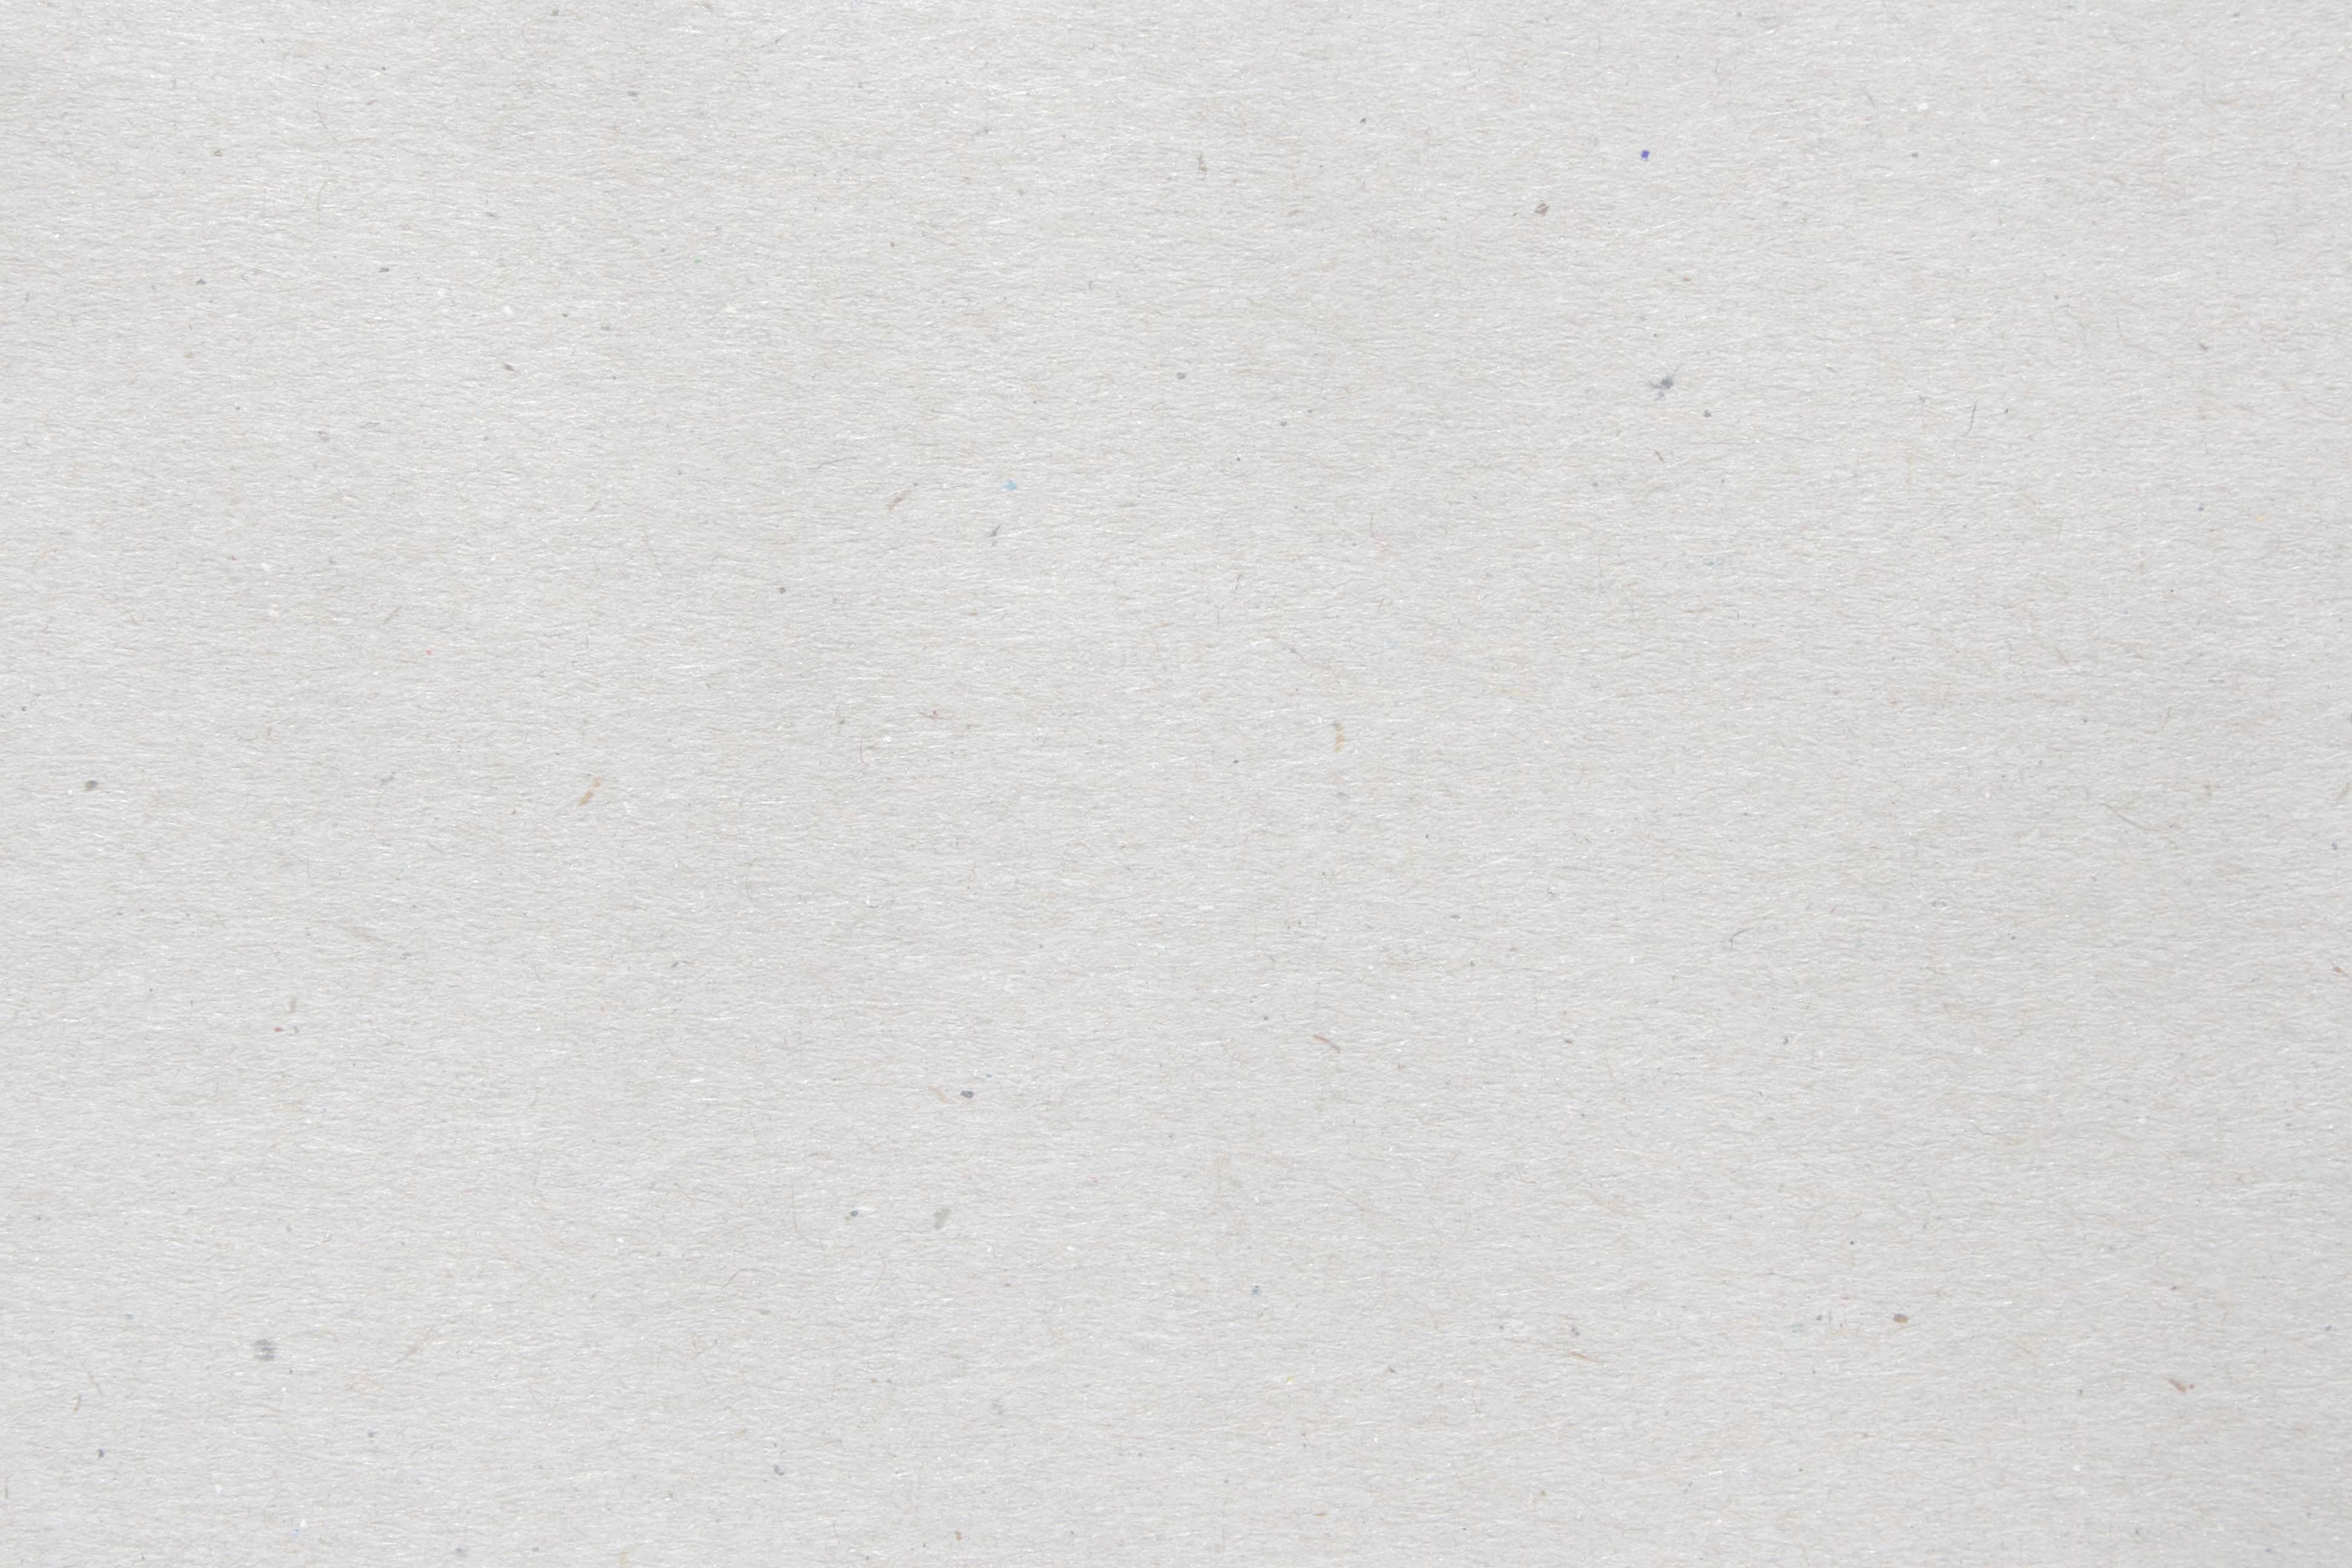 white-paper-texture-with-flecks